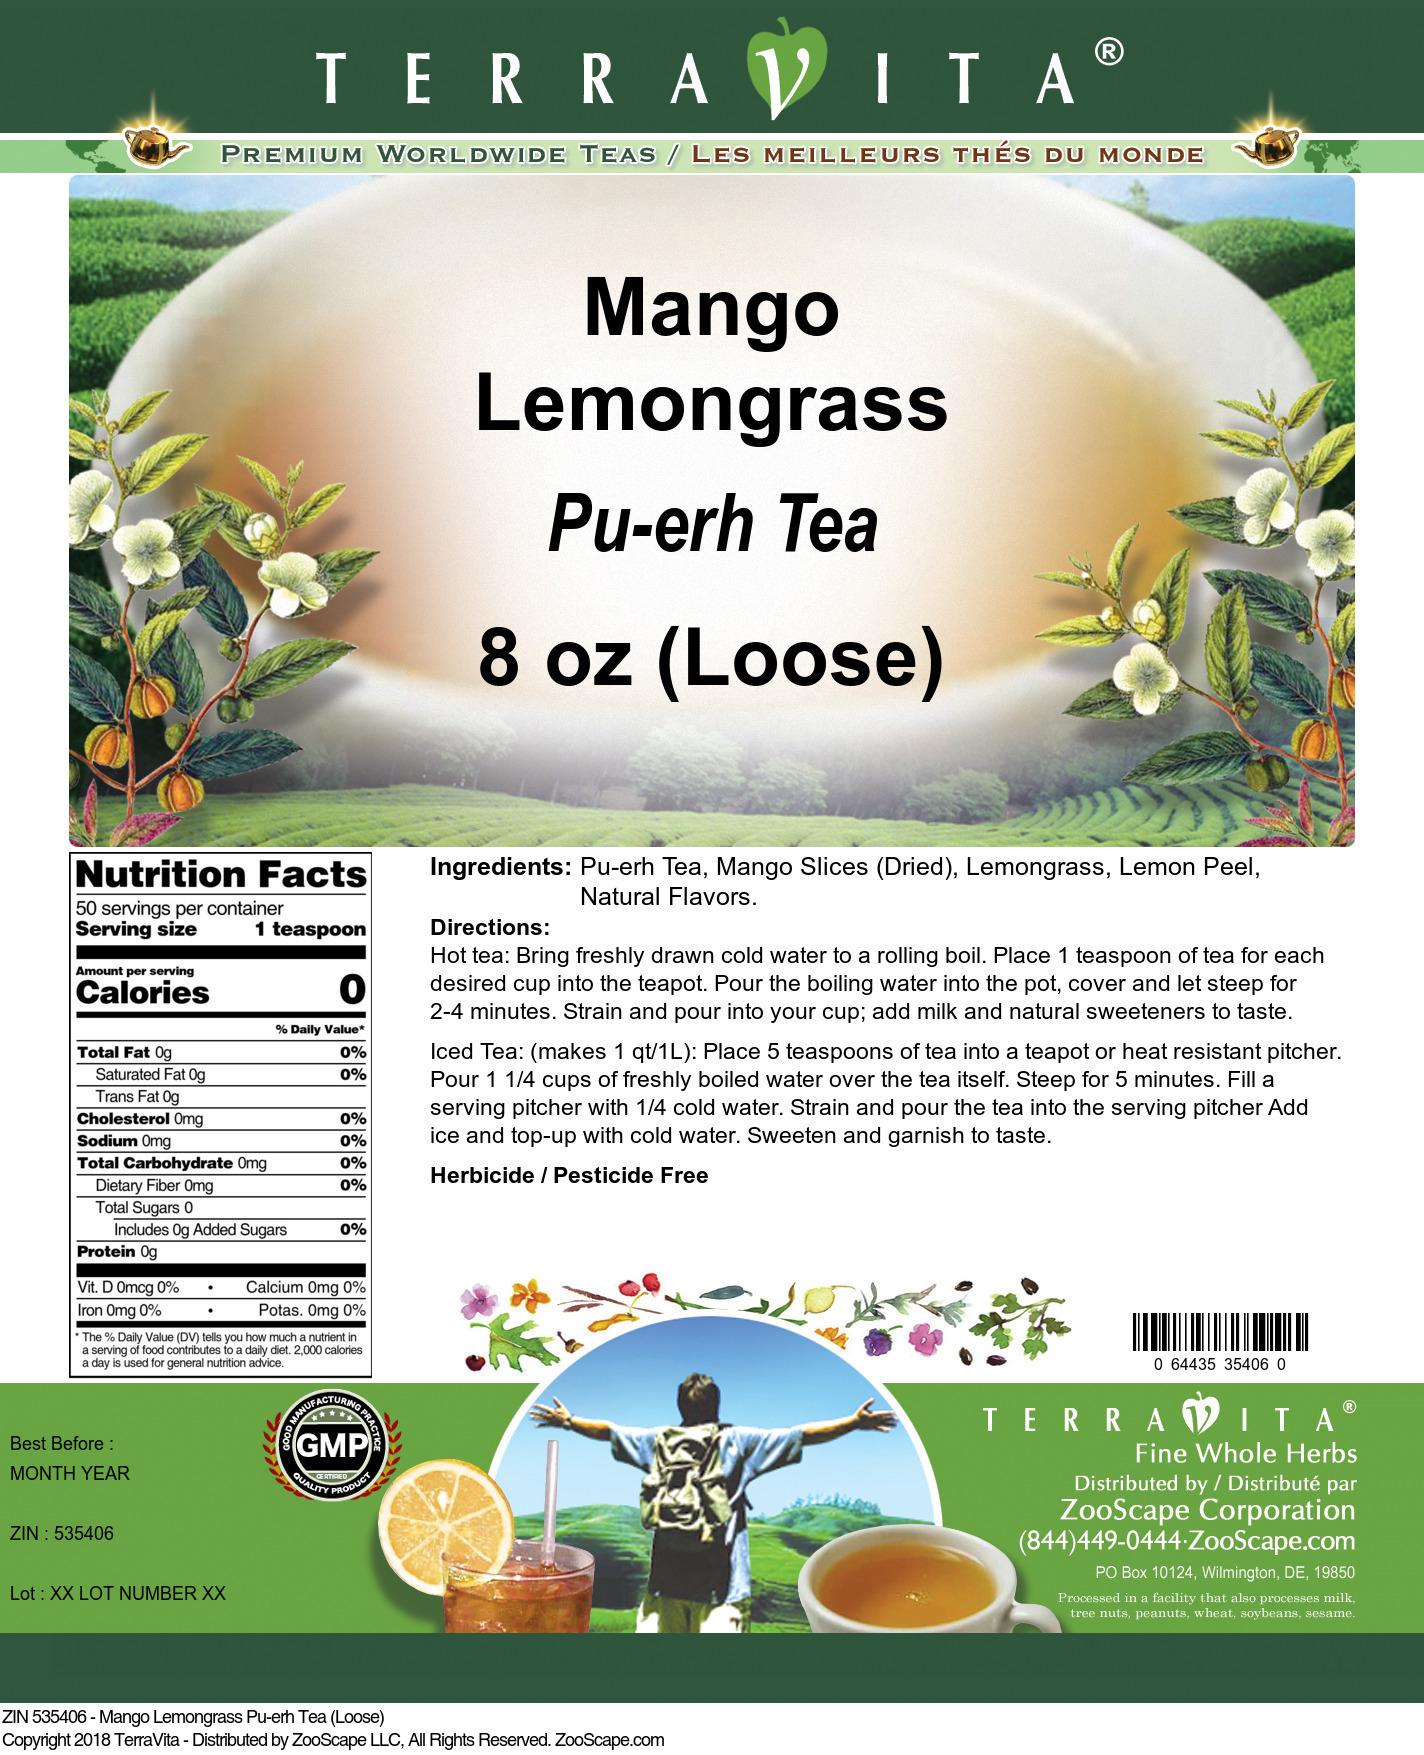 Mango Lemongrass Pu-erh Tea (Loose)